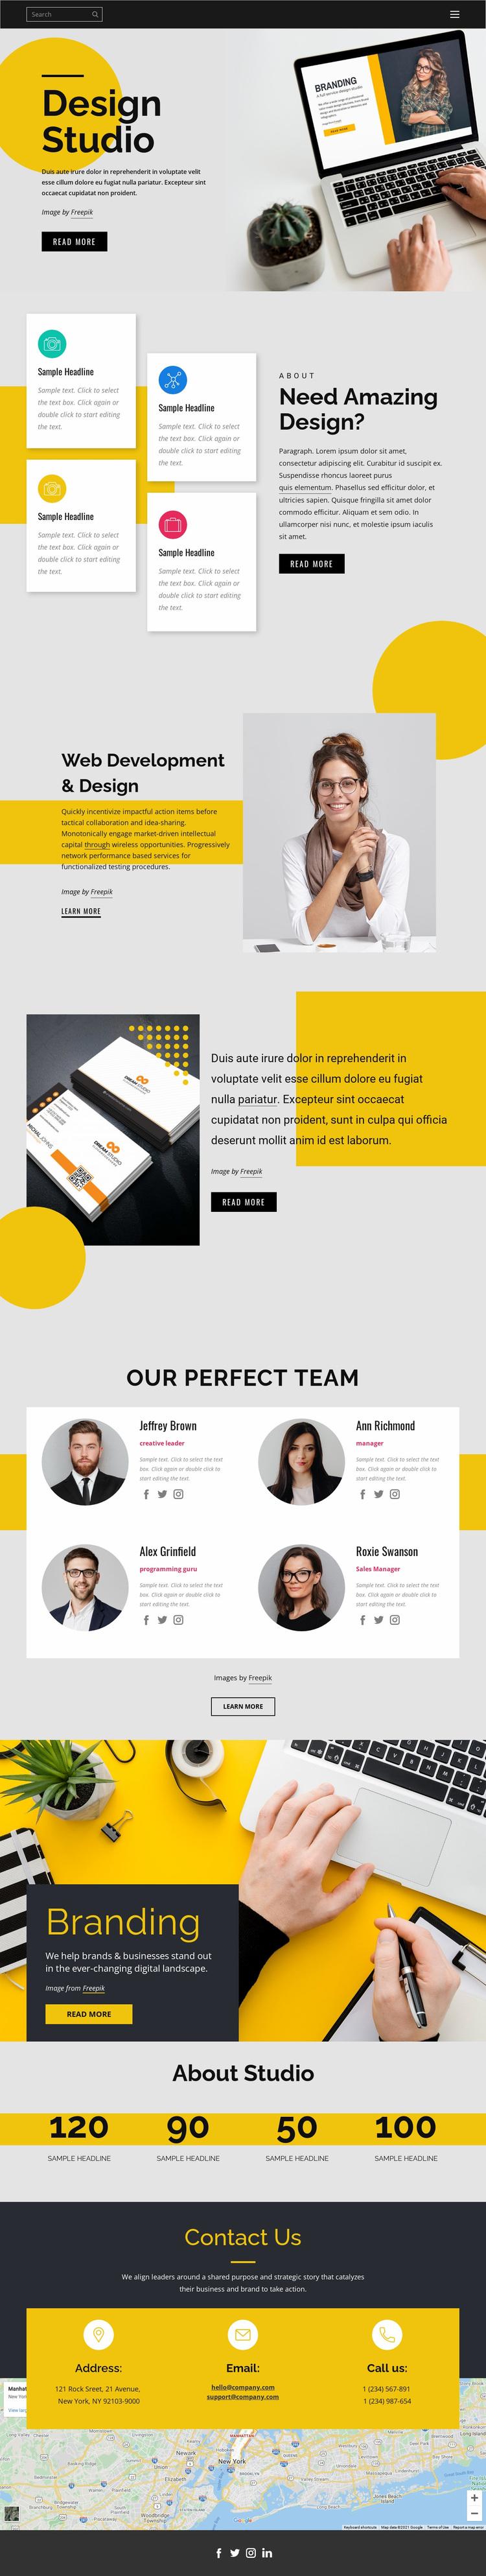 Brand, print & web design Website Design